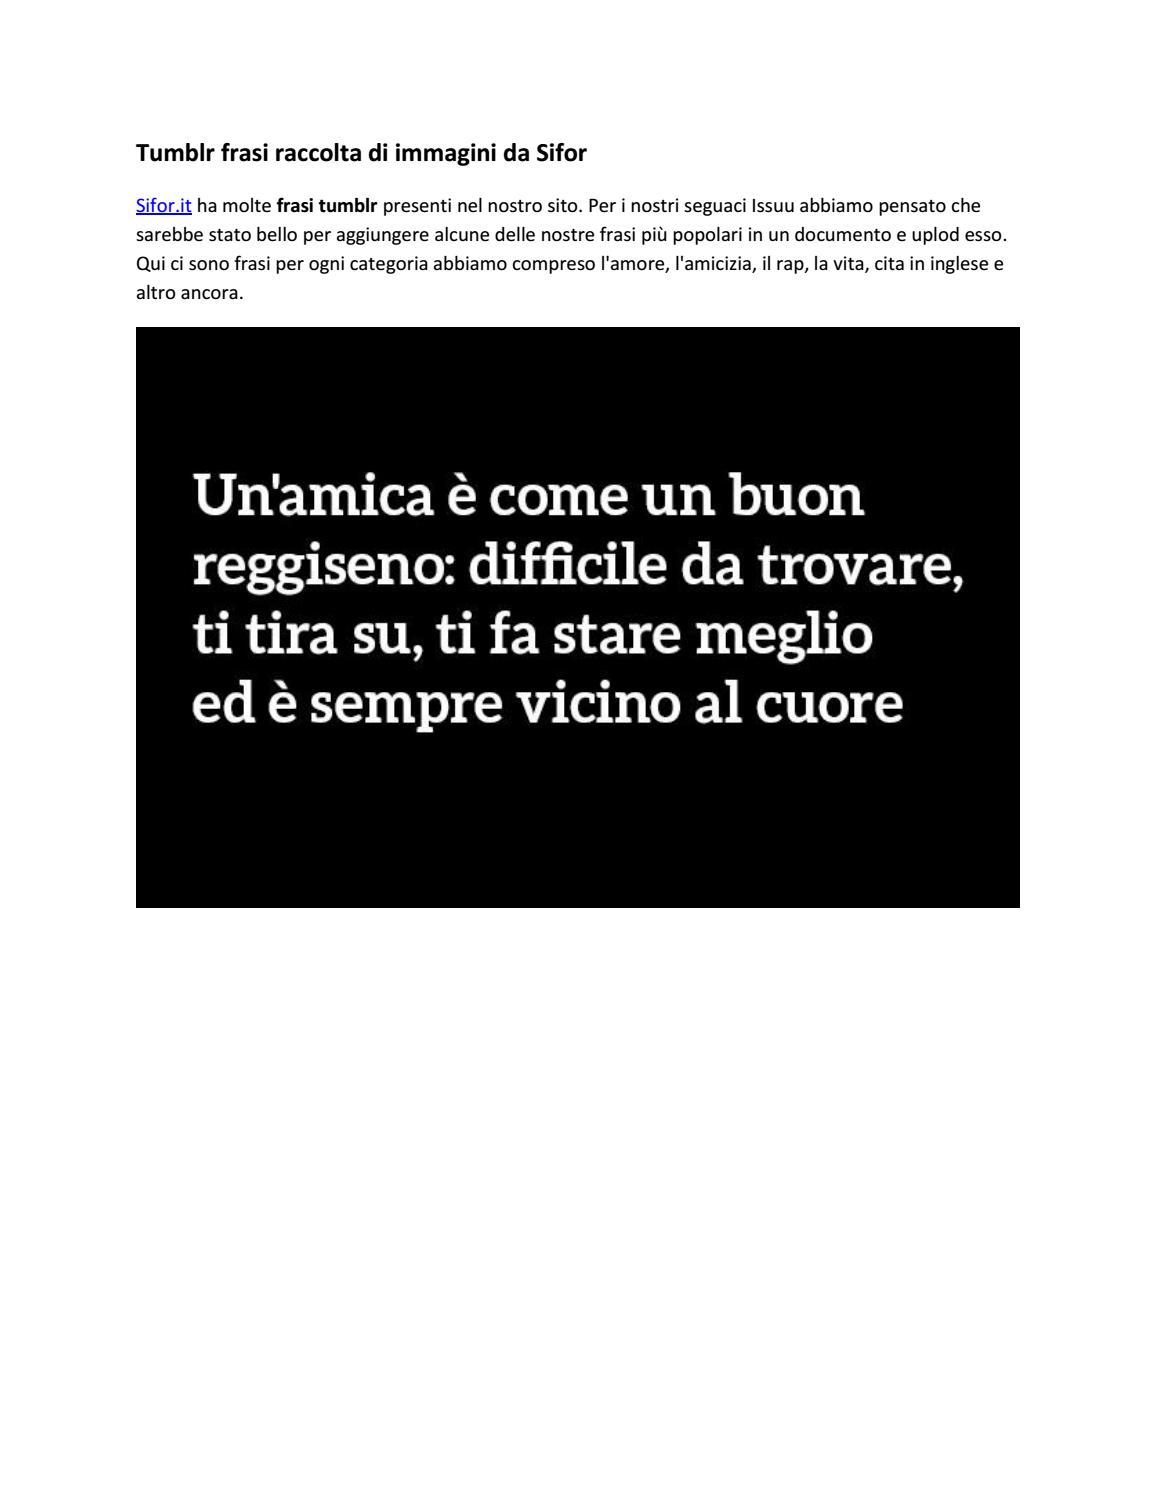 Tumblr Frasi Raccolta Di Immagini Da Sifor By Siforitaly Issuu